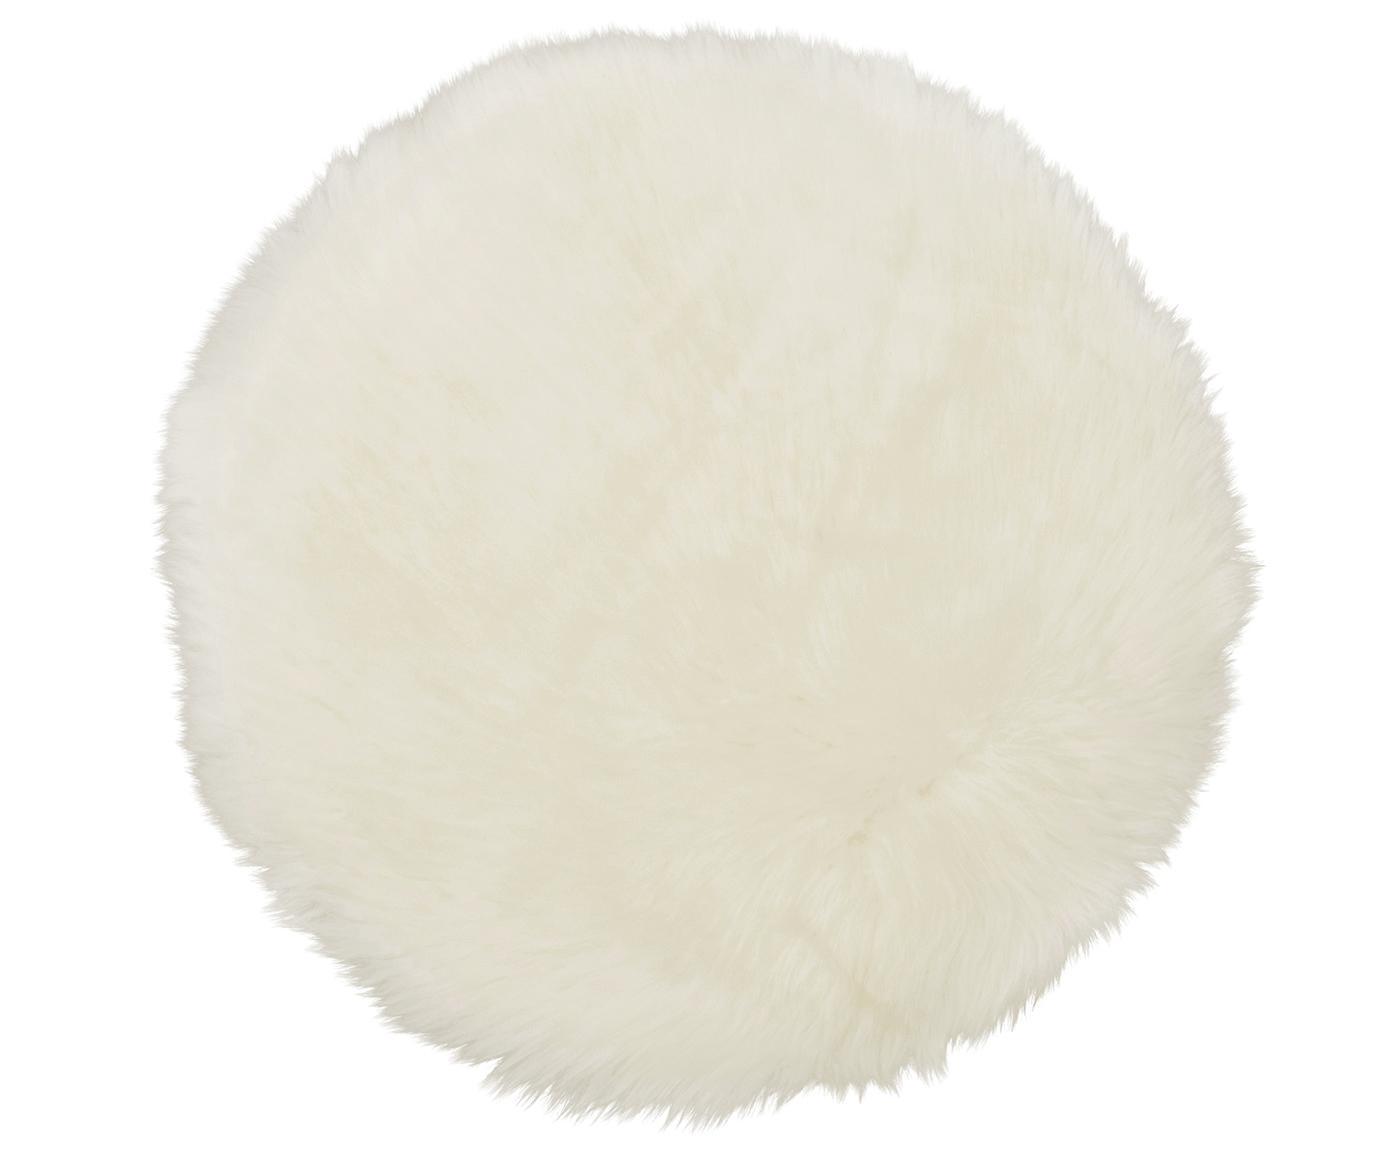 Cojín de asiento de oveja Oslo, Parte delantera: 100%piel de oveja, Parte trasera: 100%cuero cuertido, Marfil, Ø 37 cm